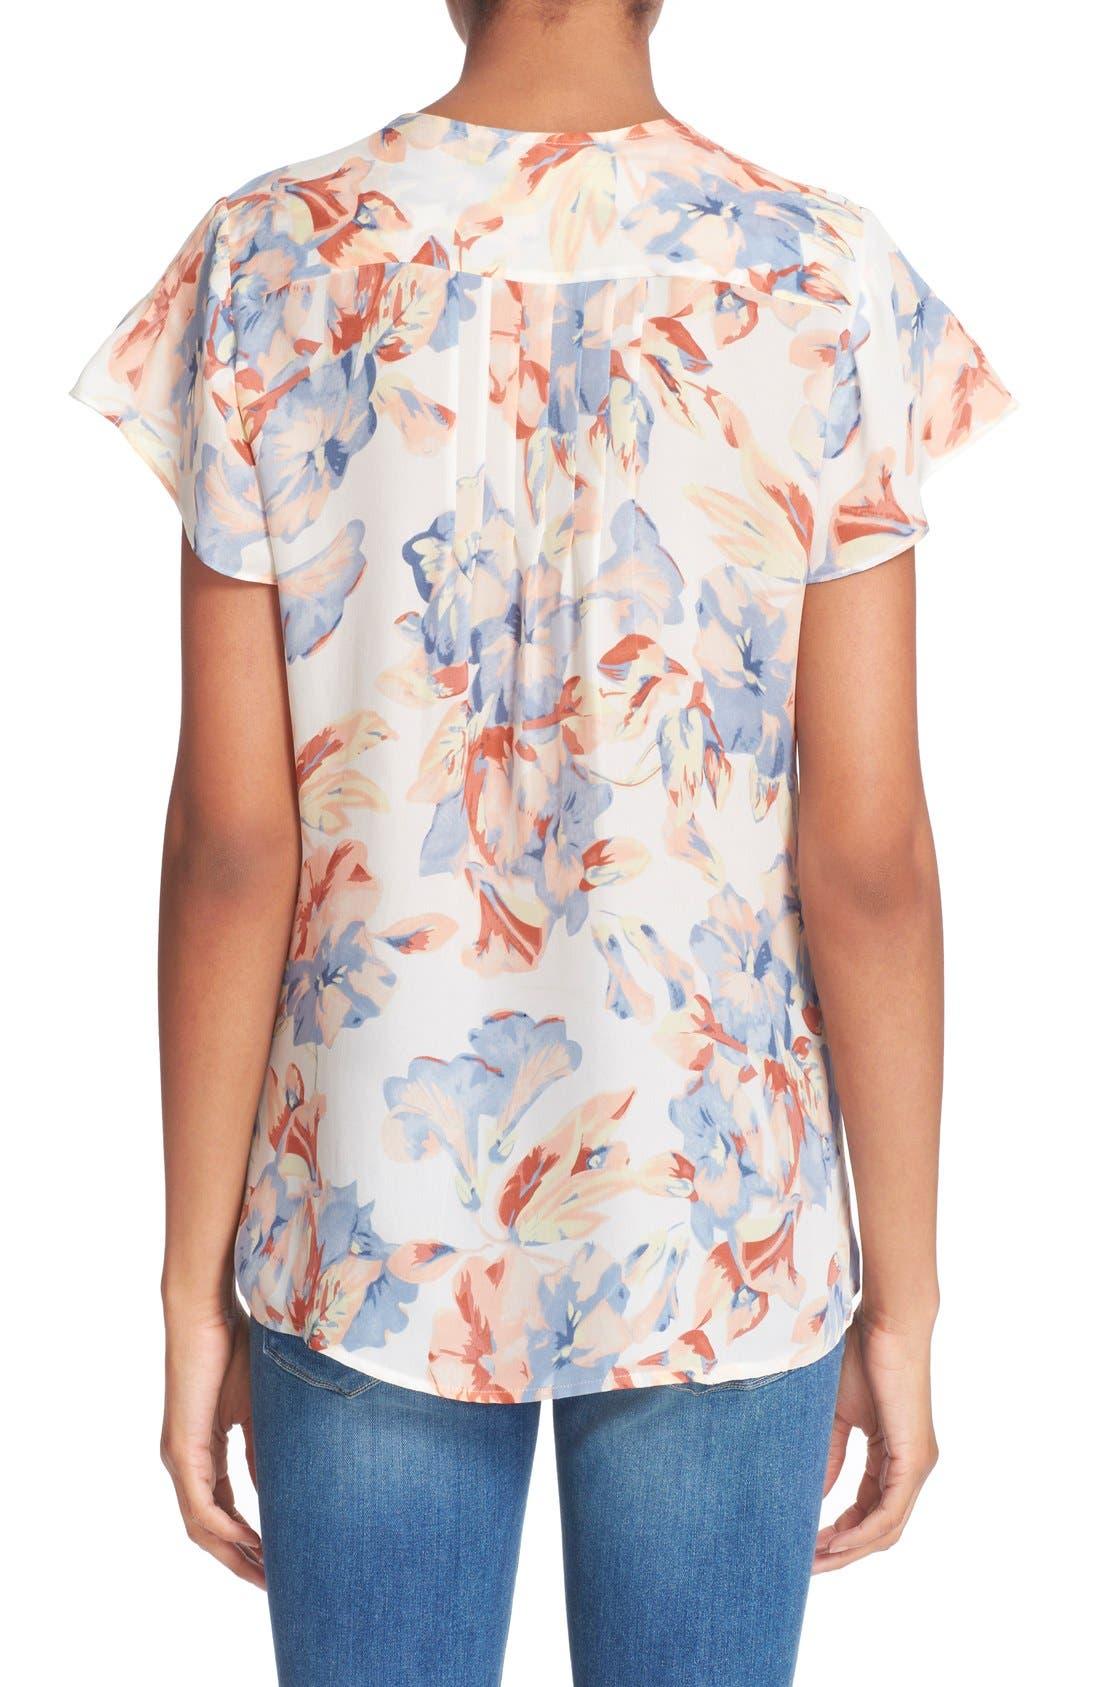 JOIE,                             'Annite' Floral Print Silk Top,                             Alternate thumbnail 4, color,                             901